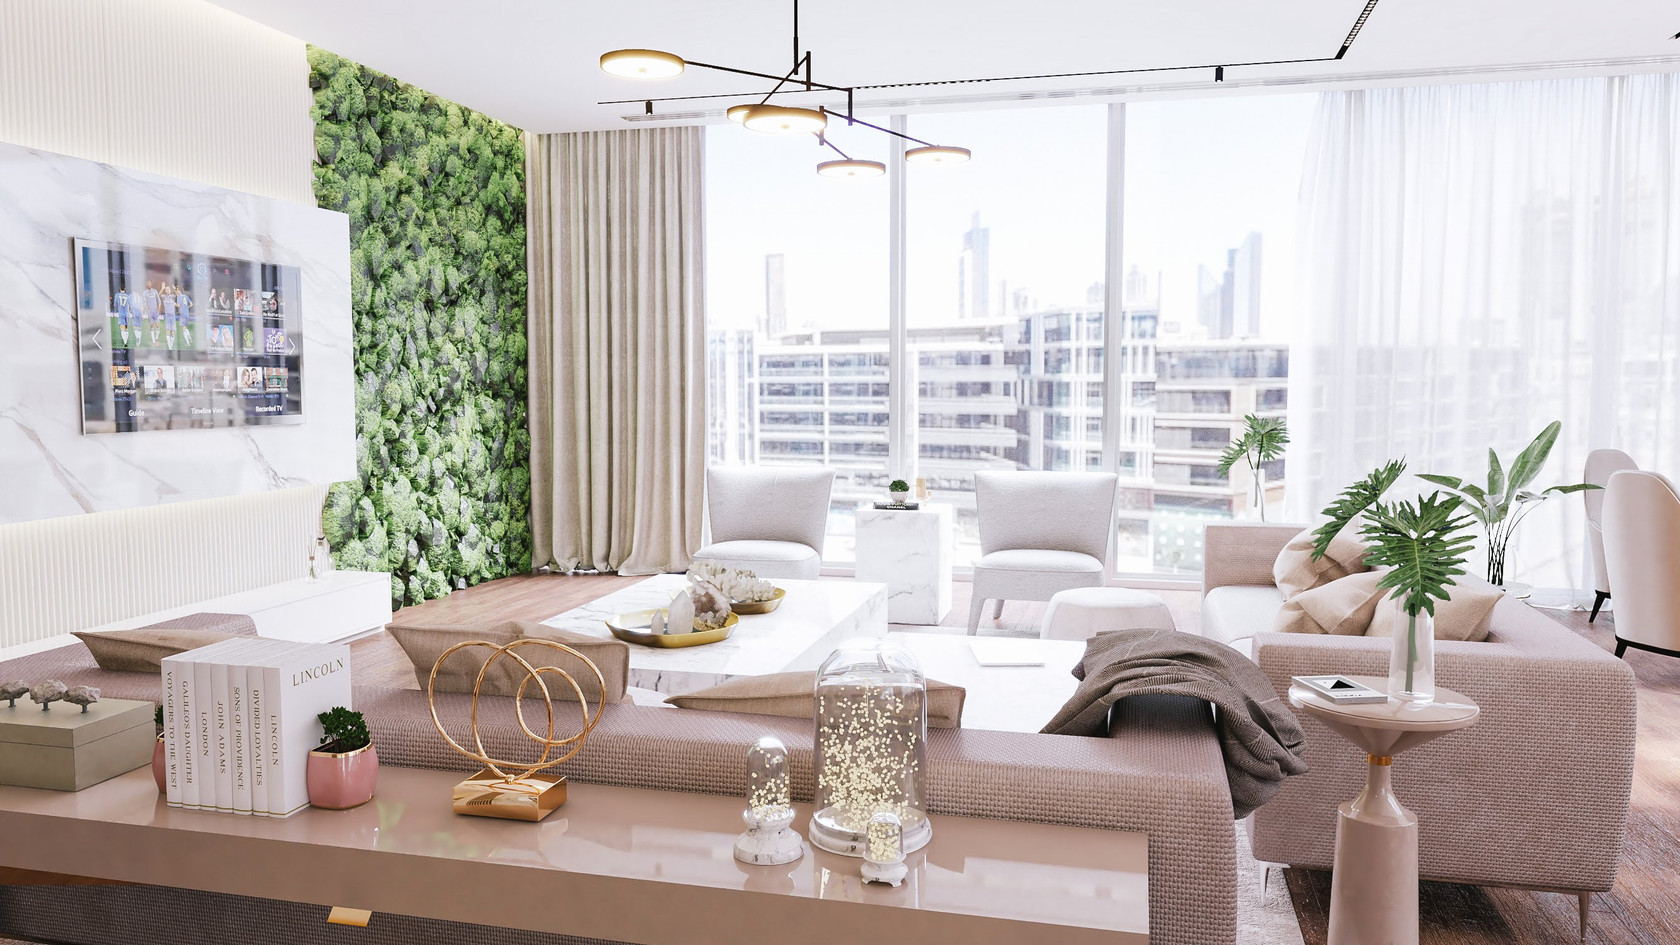 Dubai - City Walk - Living room - 01.jpg